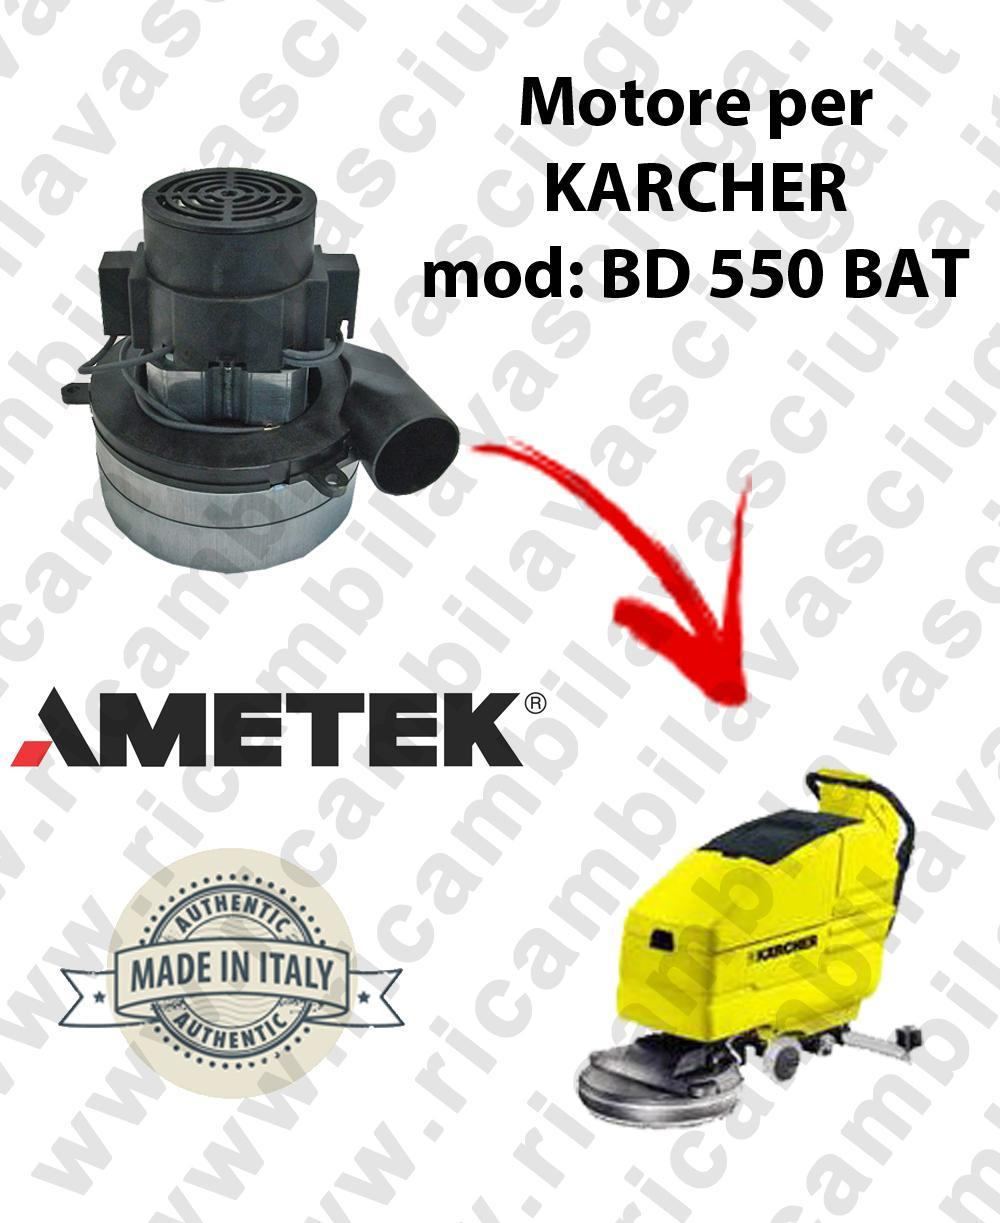 BD 550 BATT Saugmotor AMETEK für scheuersaugmaschinen KARCHER